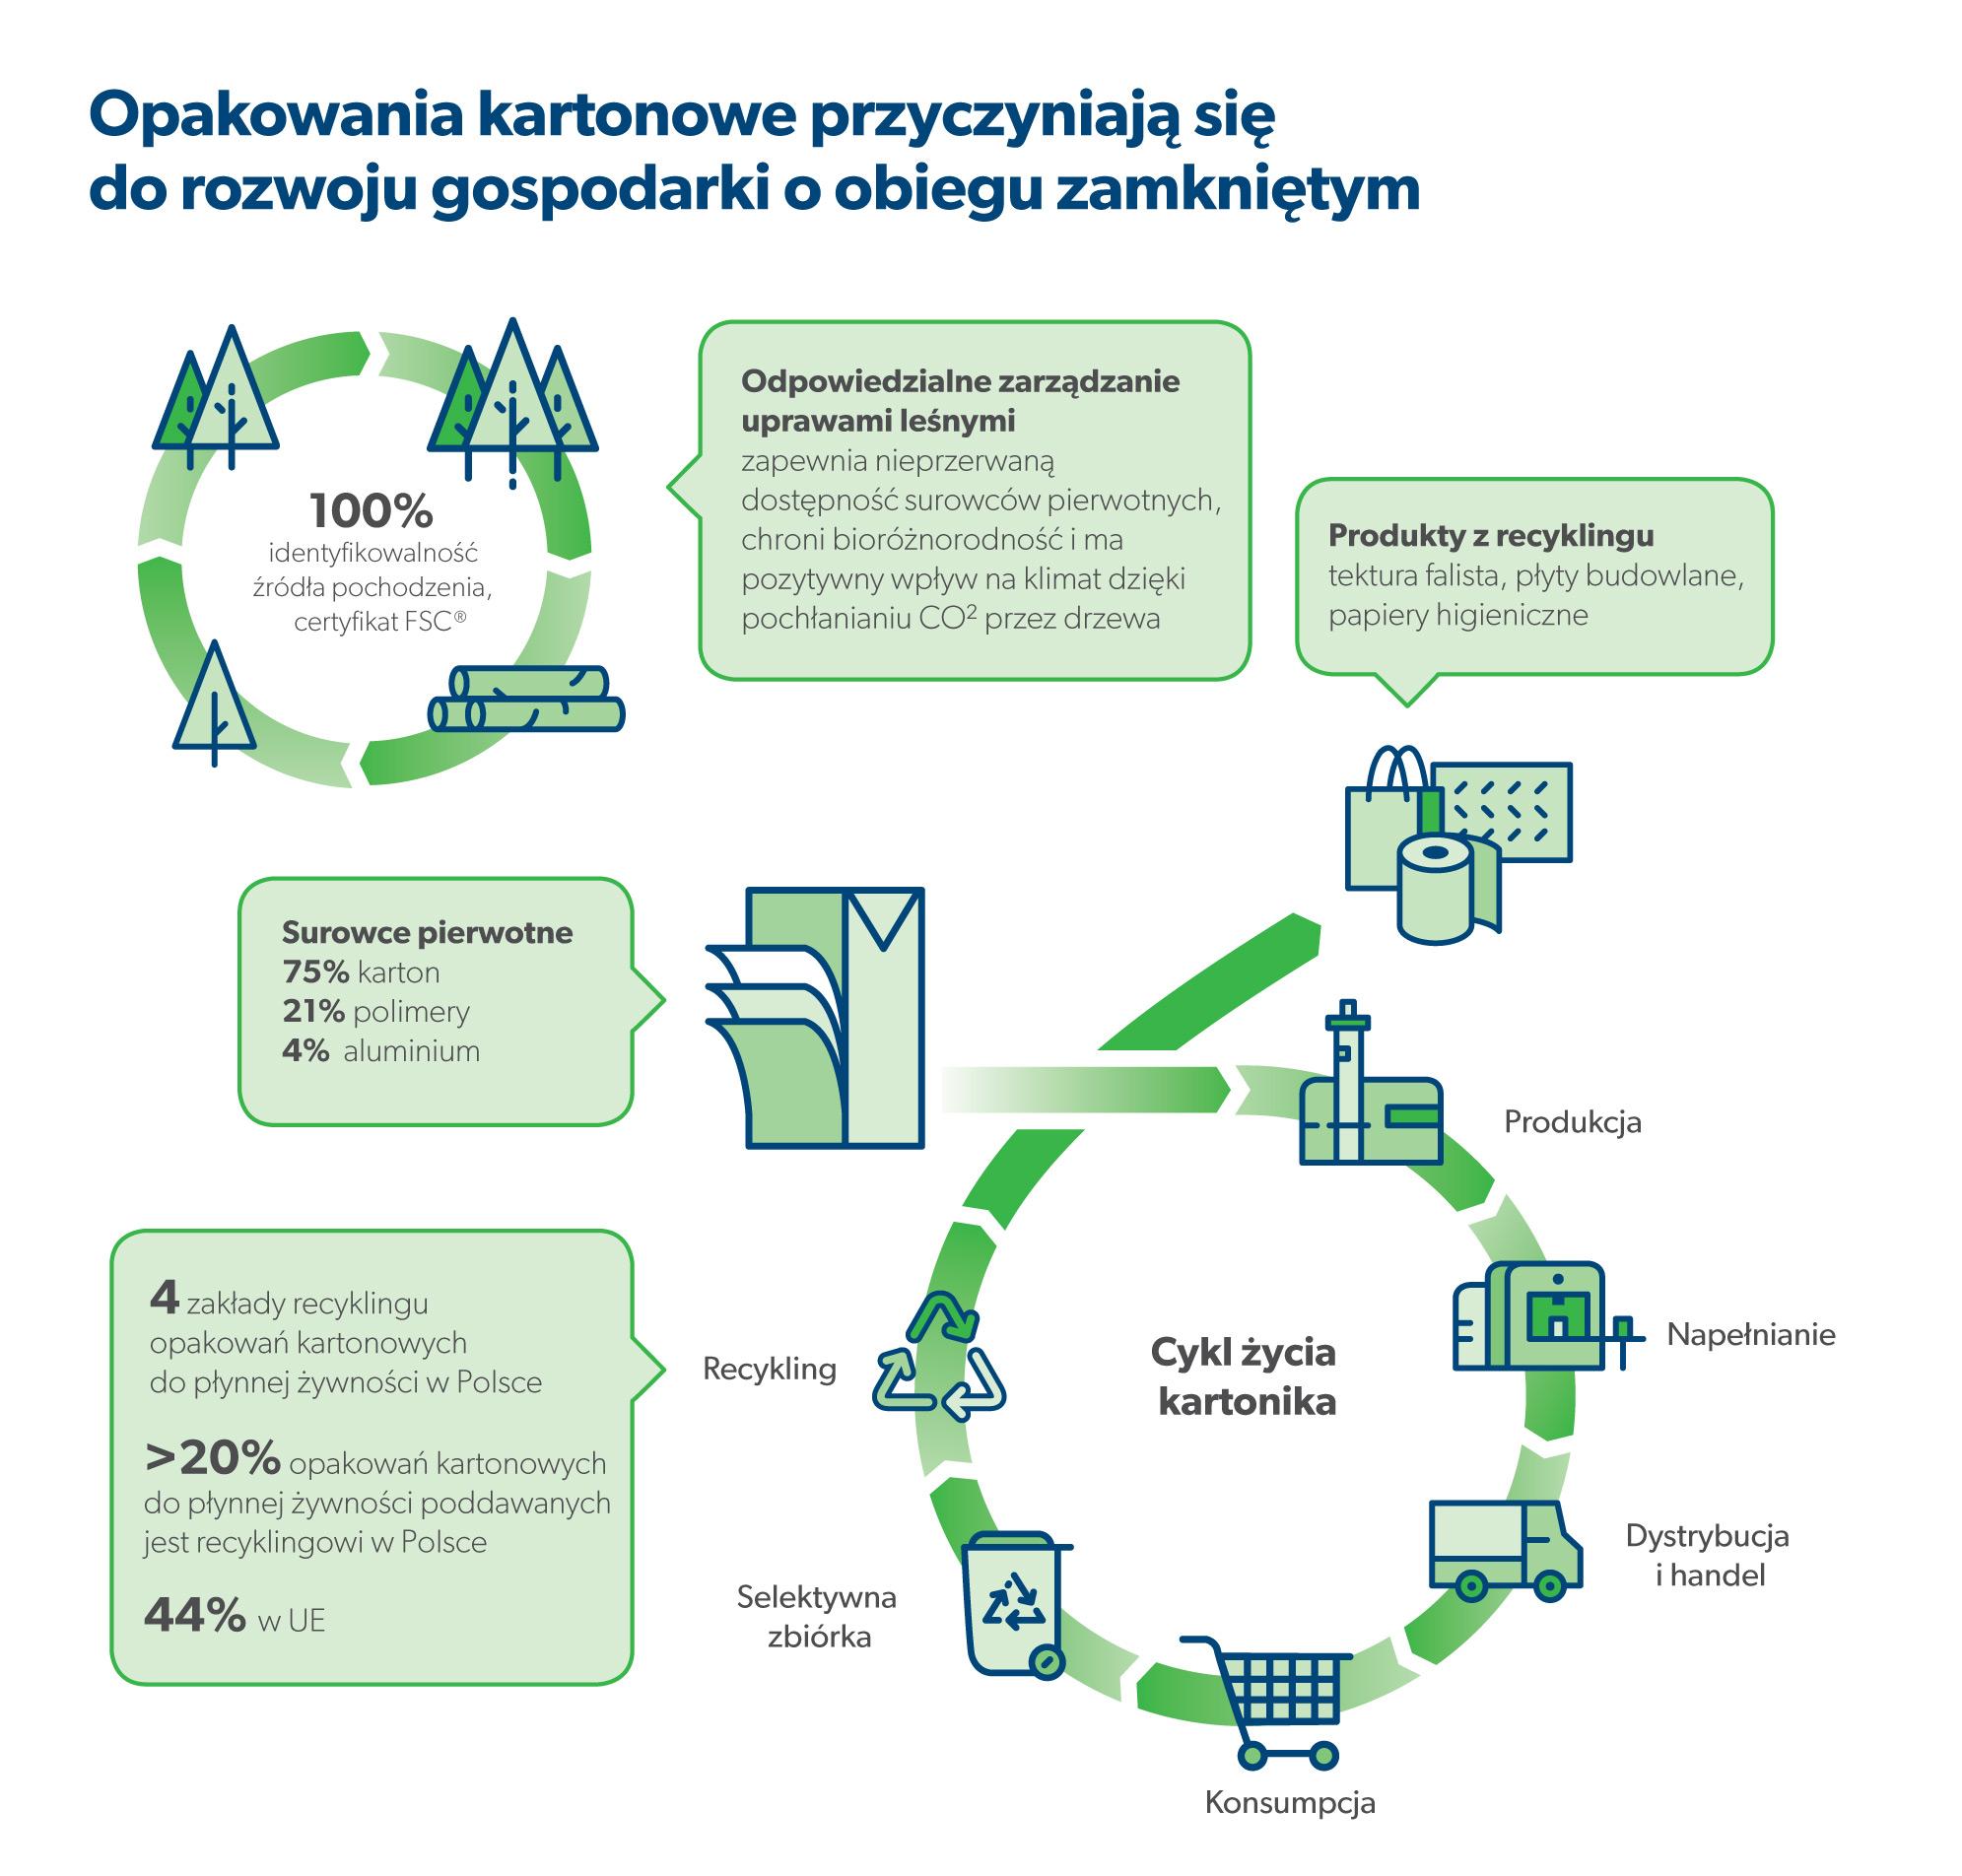 circular economy schemat